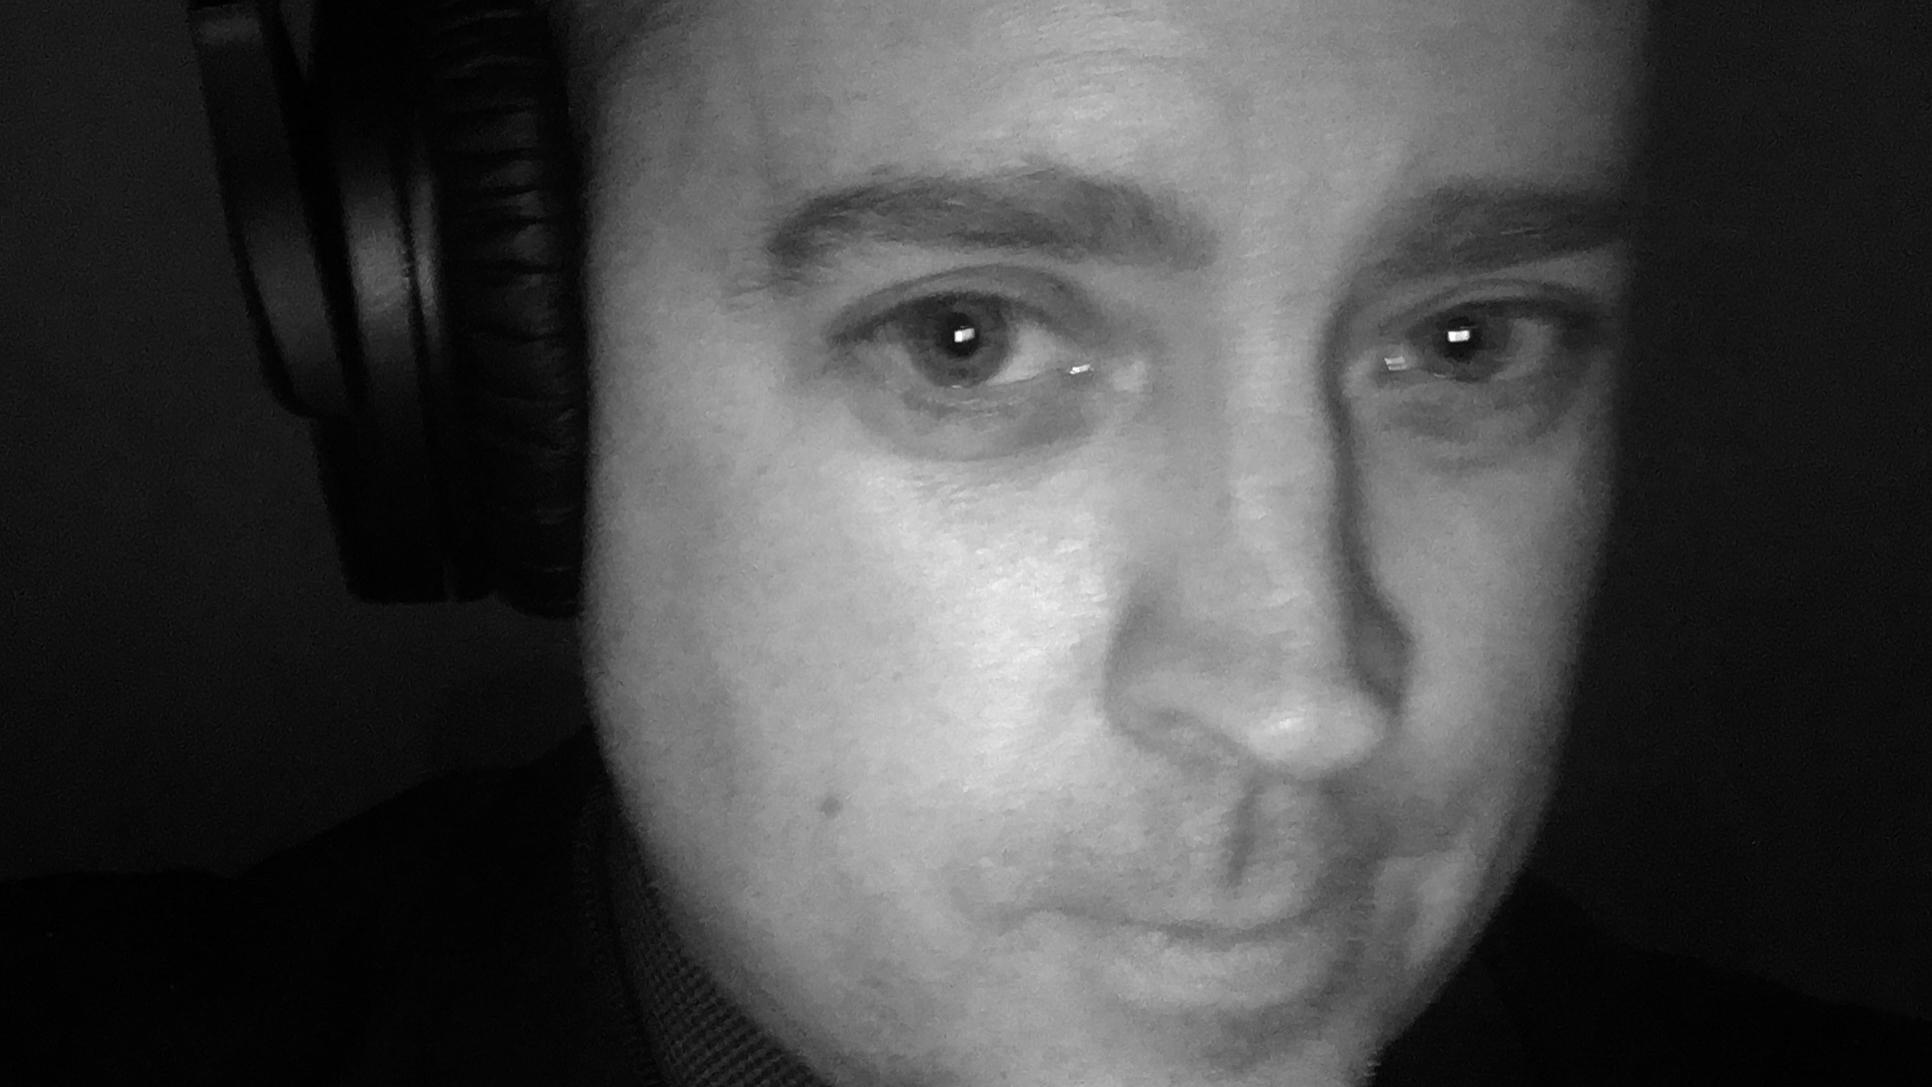 Jon aka DJFM / 2015 / Selfie